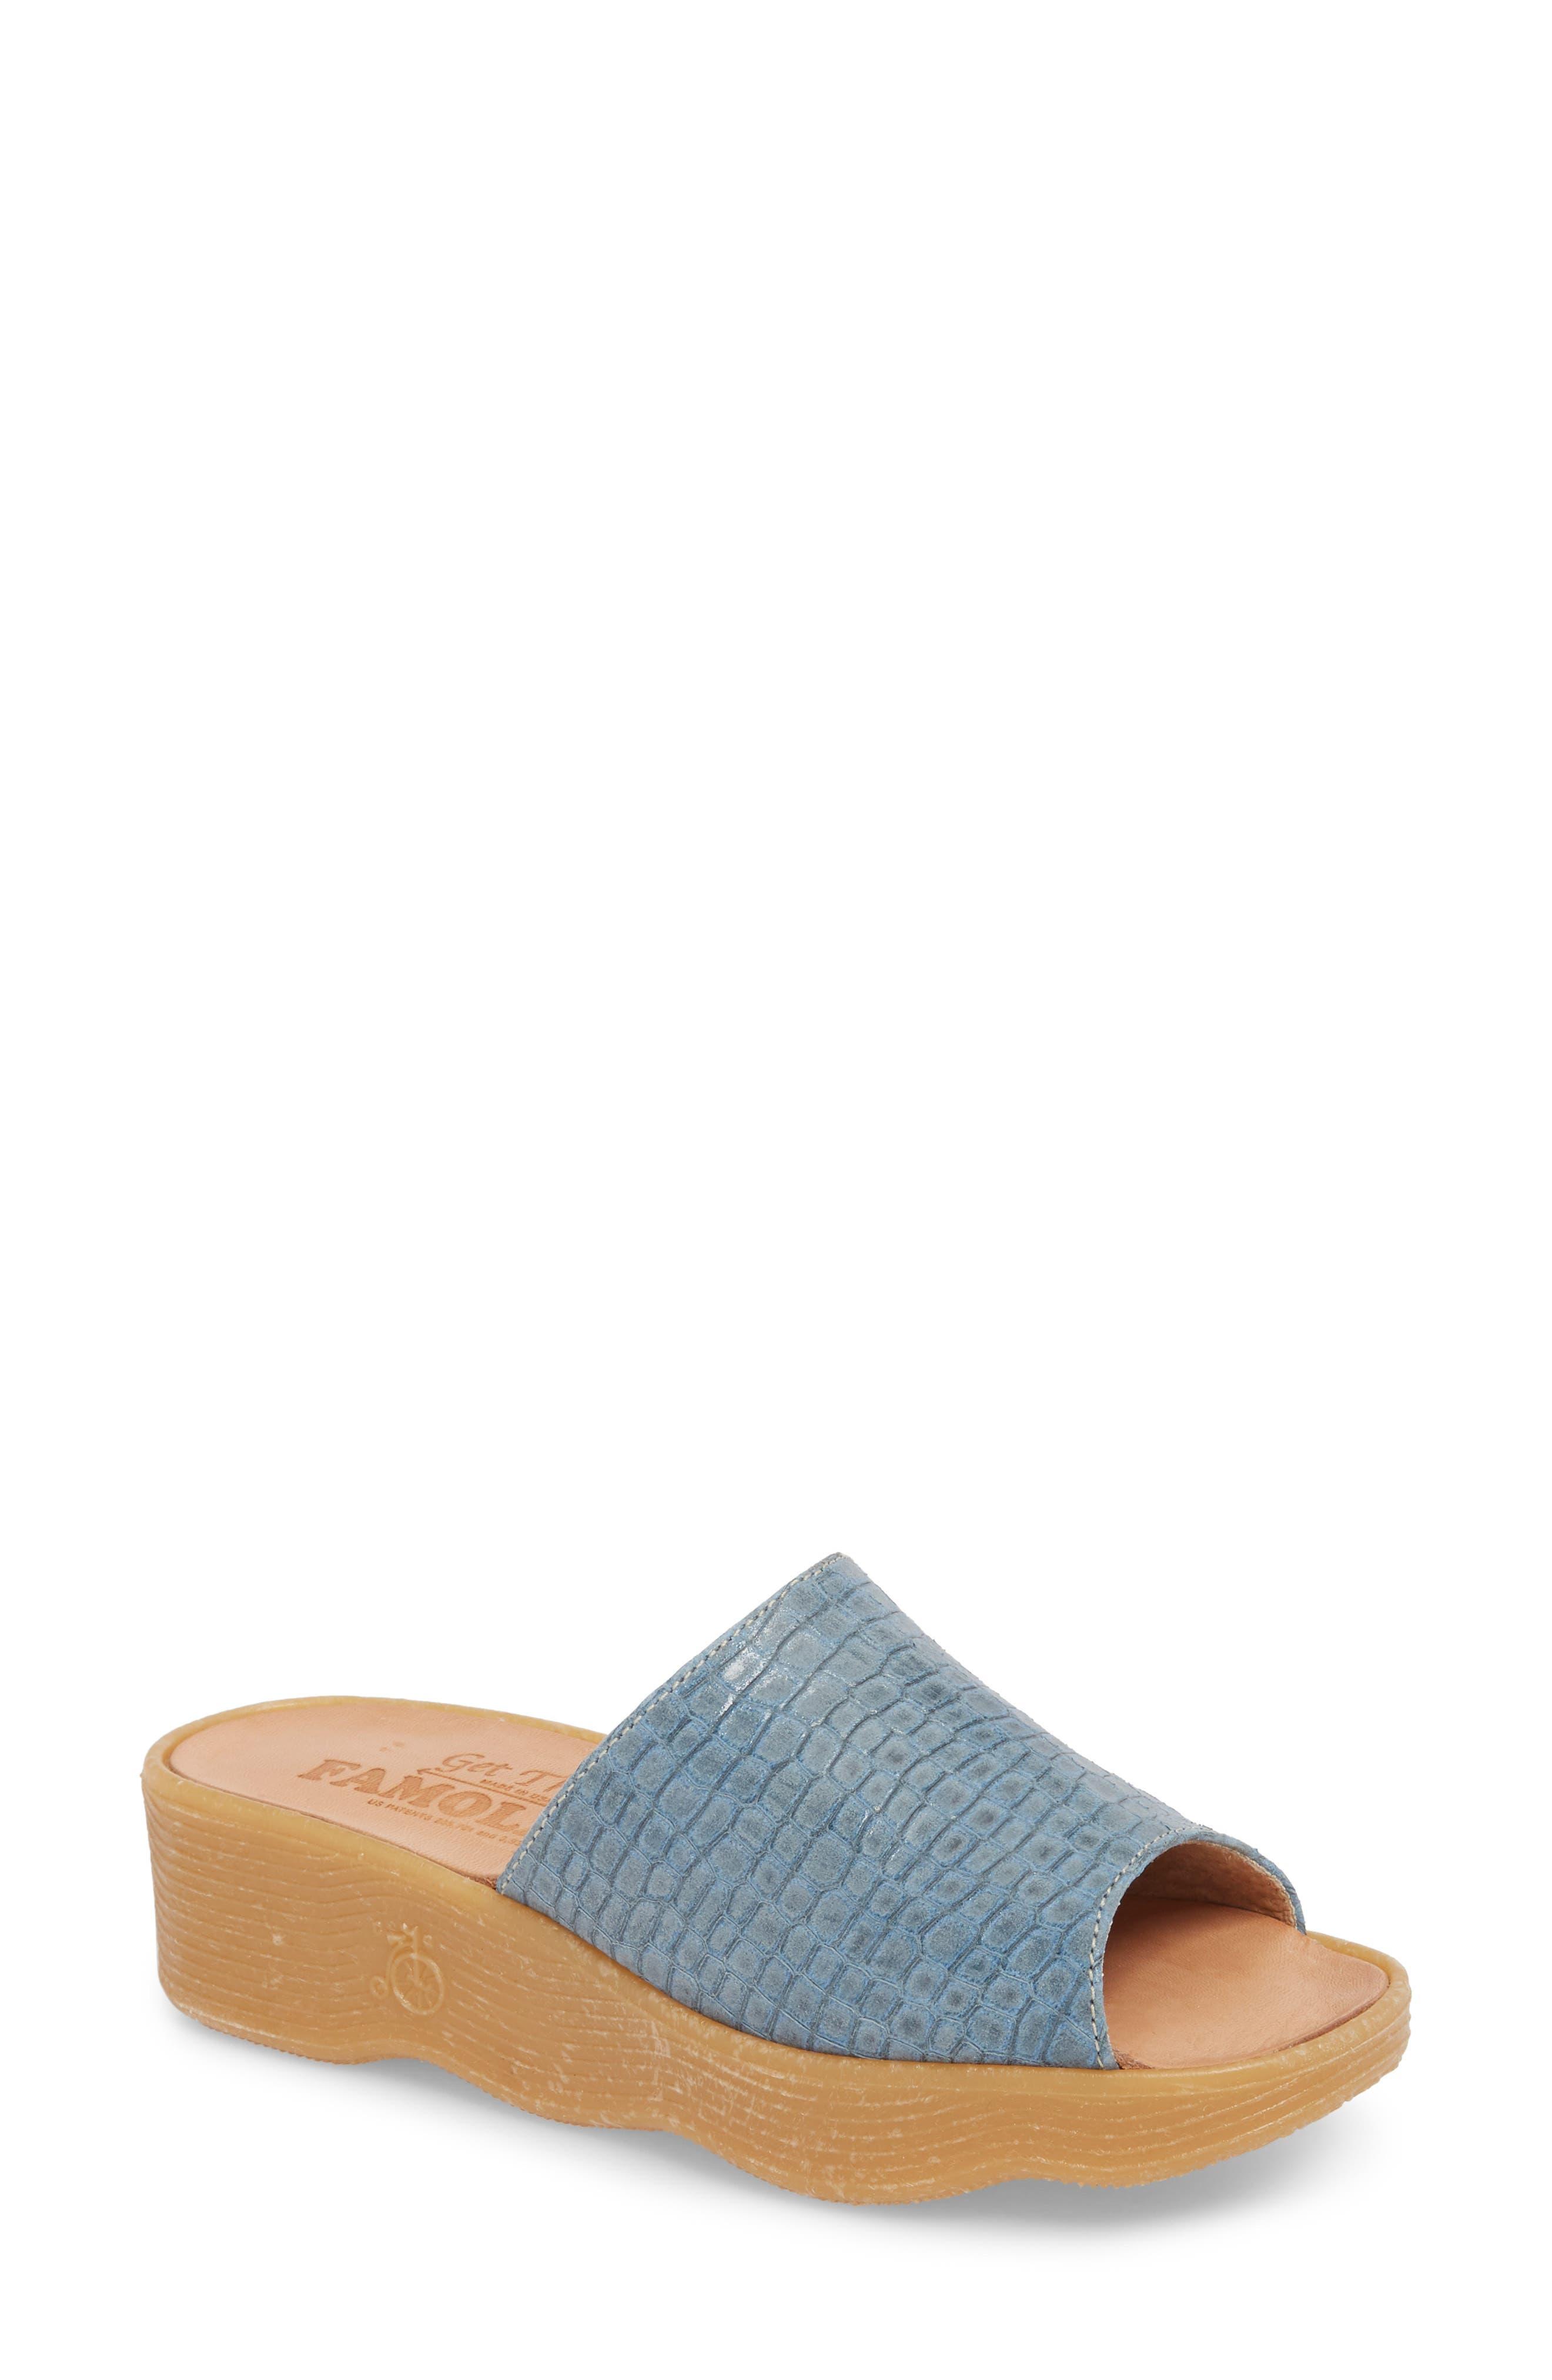 Slide N Sleek Wedge Slide Sandal,                         Main,                         color, Aqua Croc Printed Leather